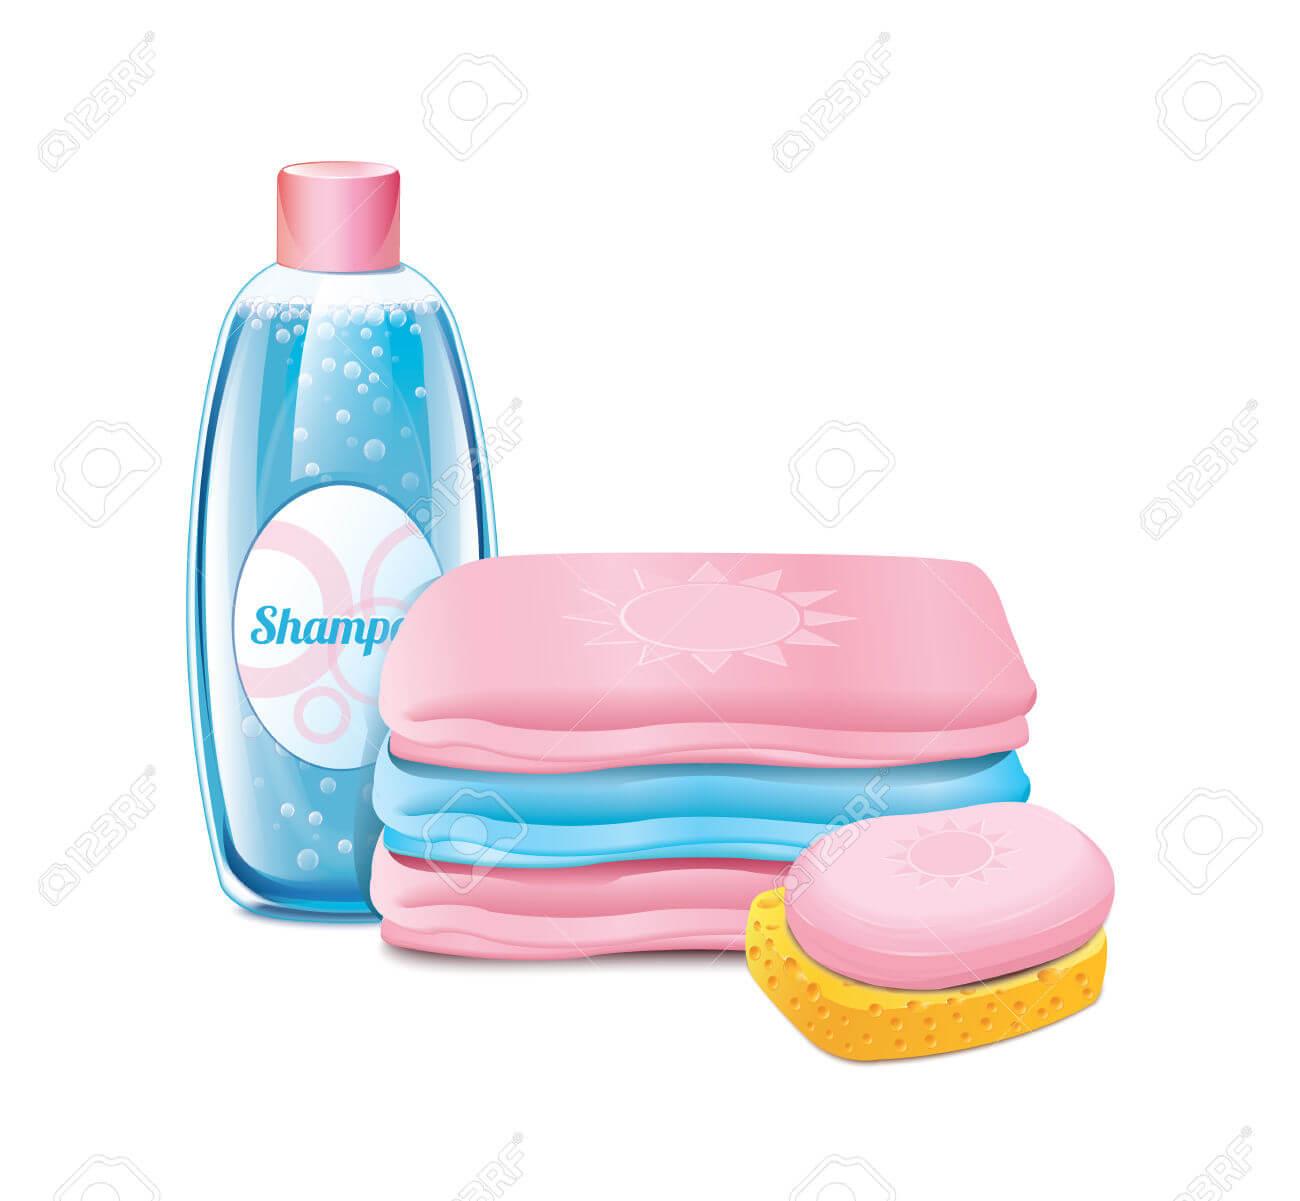 شامپو و صابون موی سر و بدن